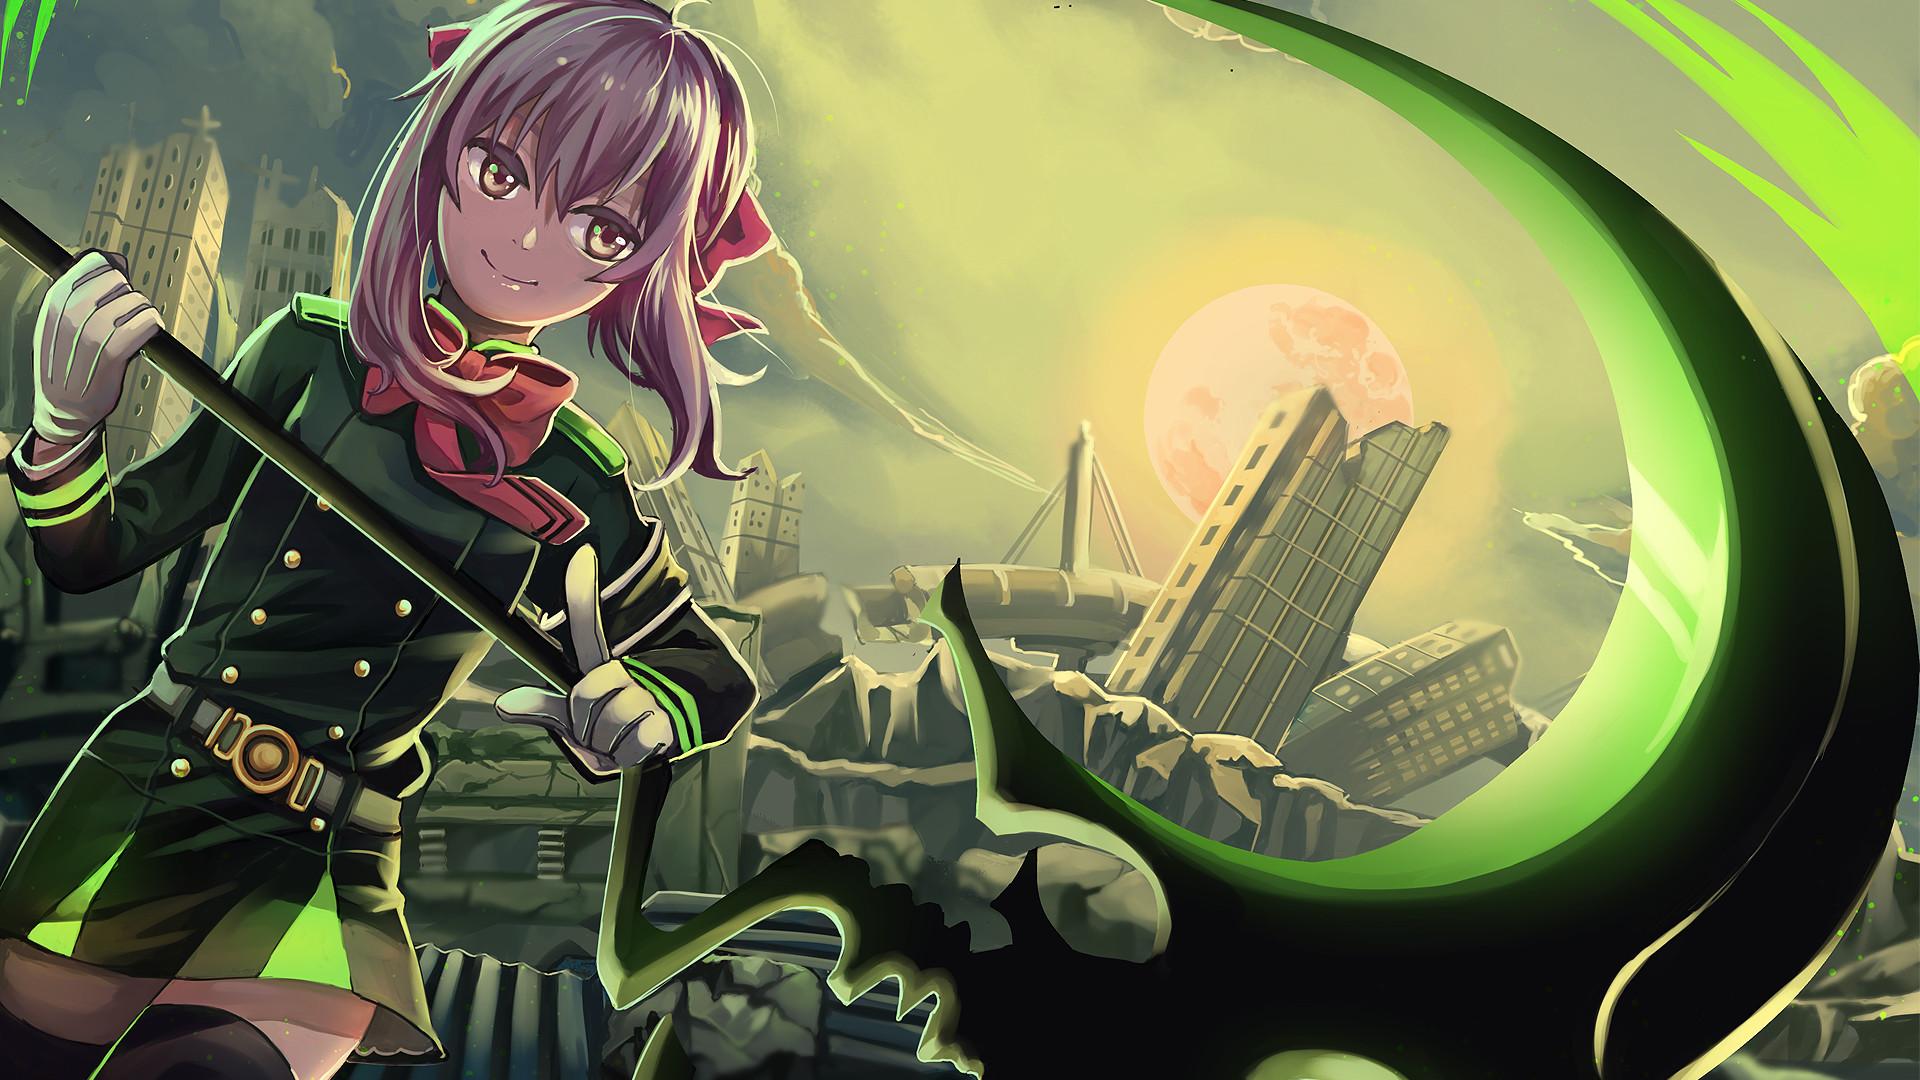 Anime Wallpaper For Windows 8 83 Images